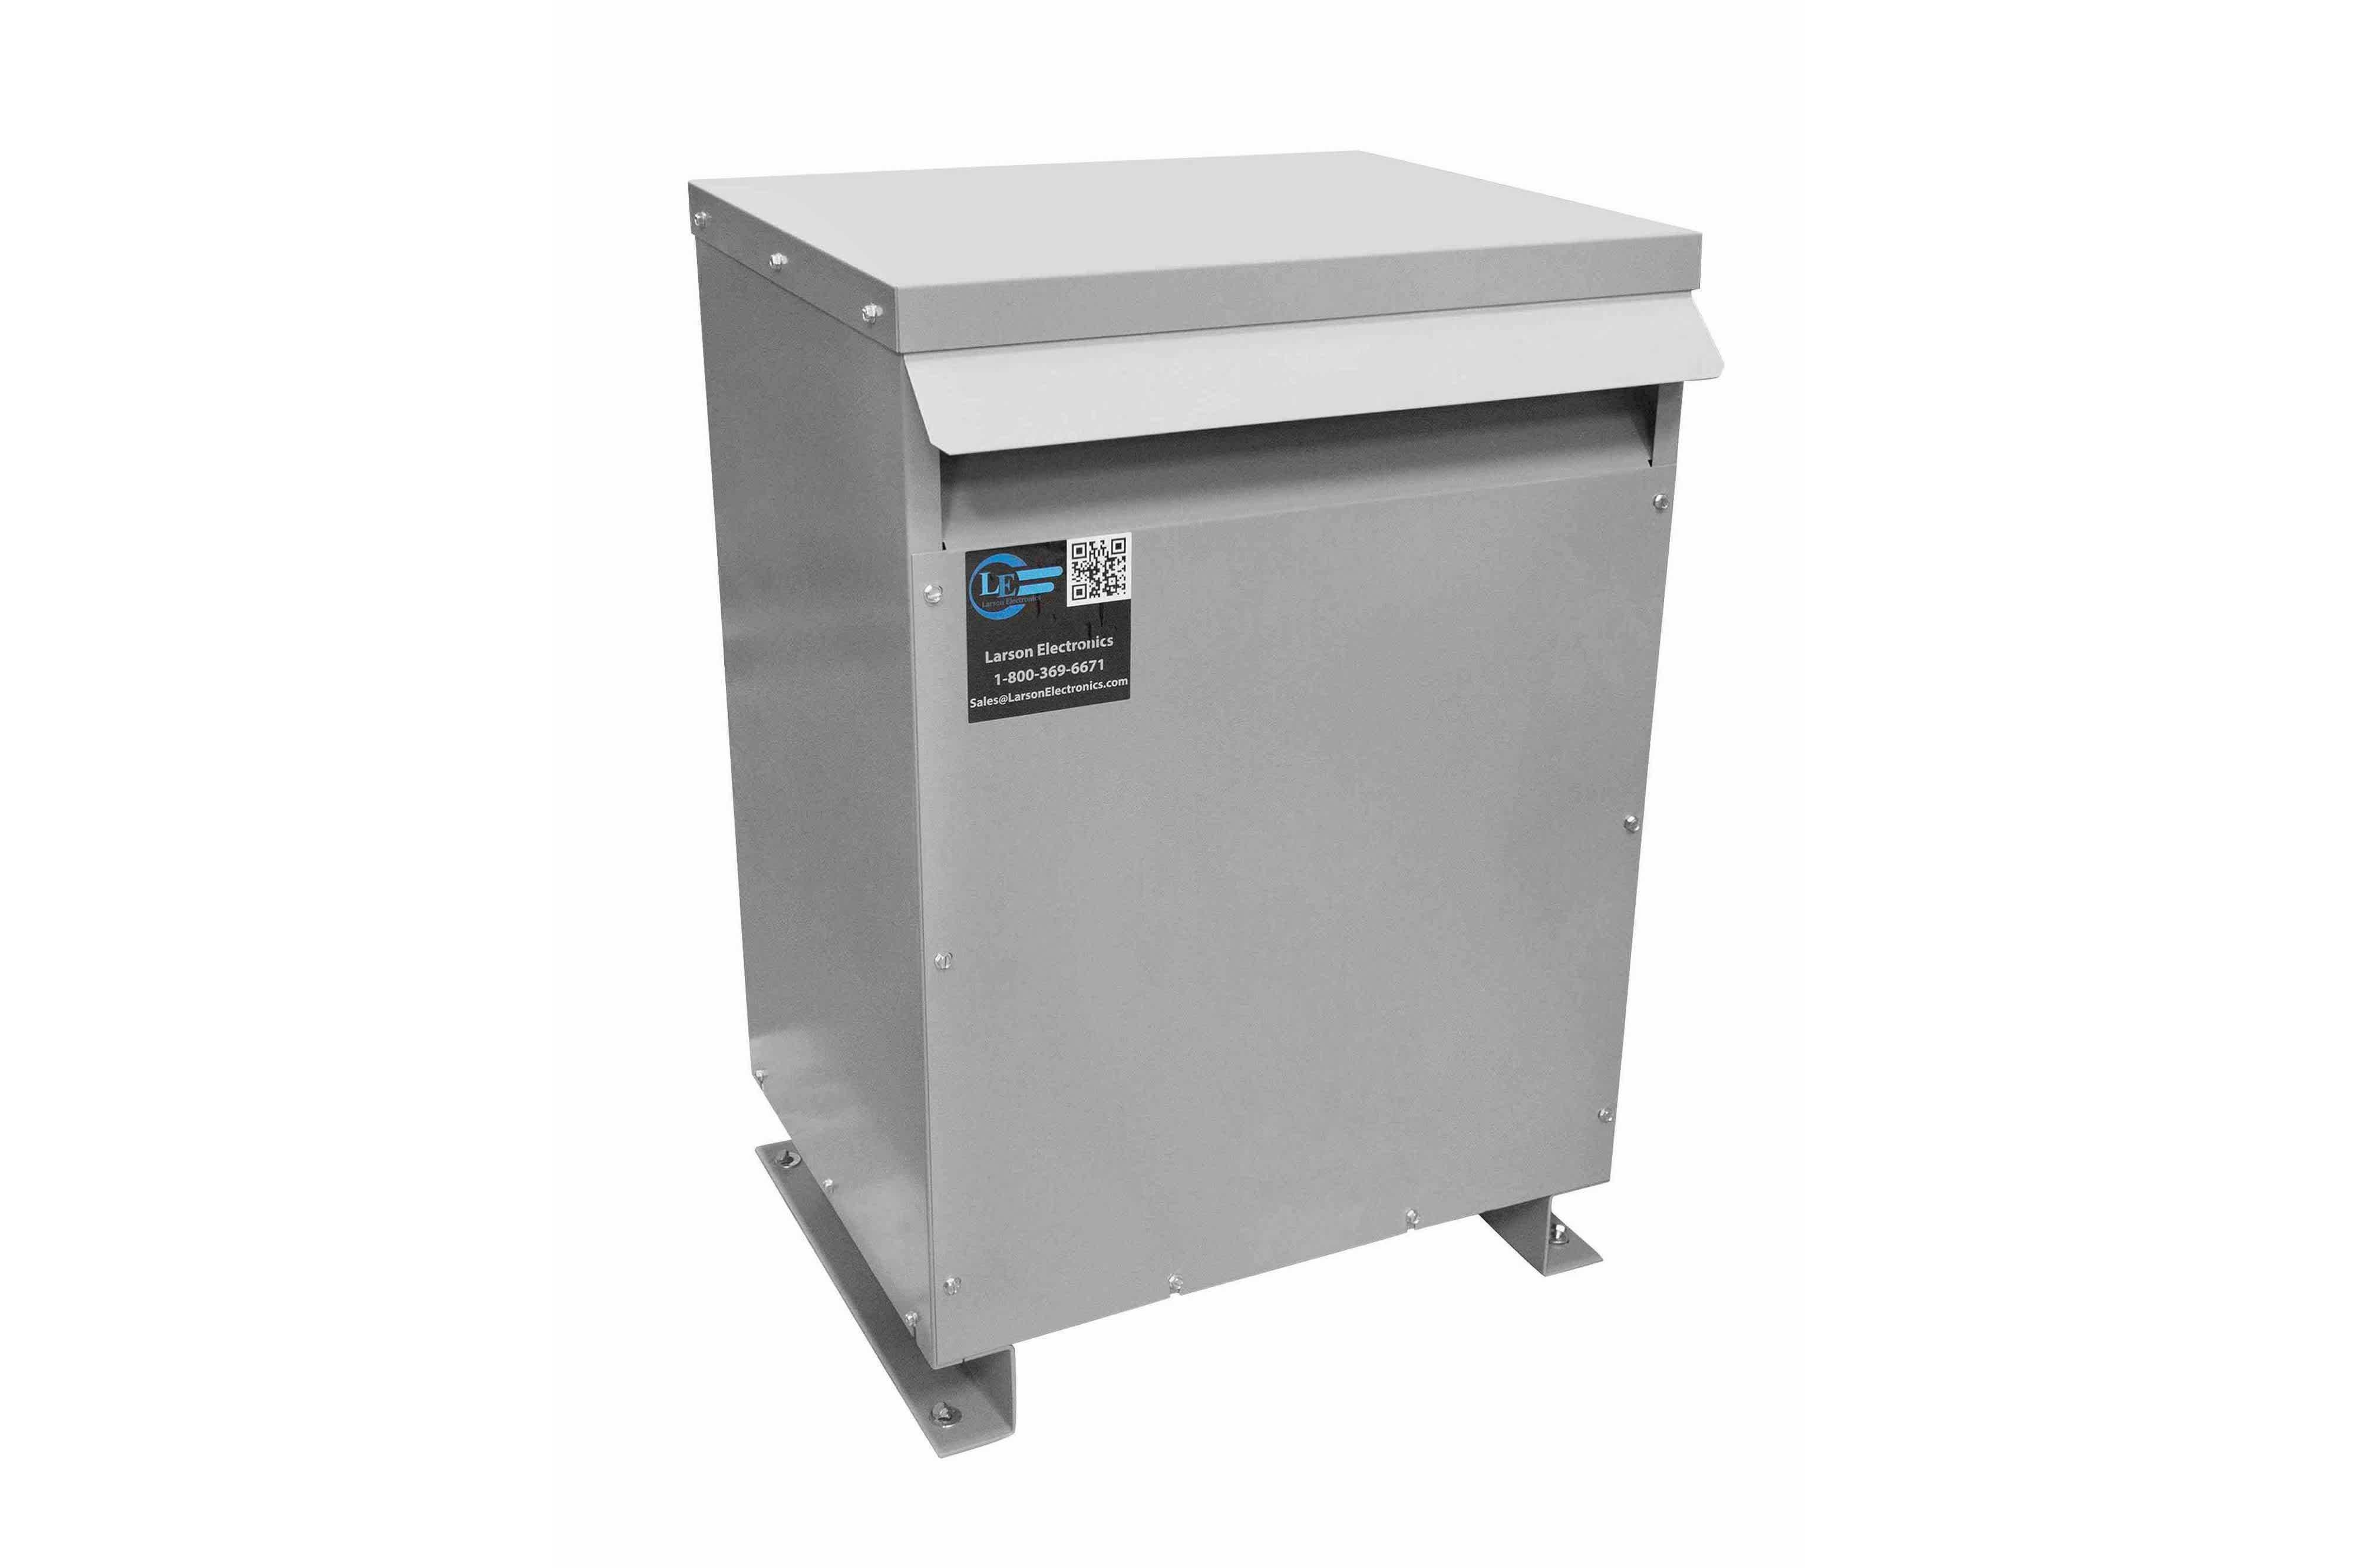 10 kVA 3PH Isolation Transformer, 380V Wye Primary, 480Y/277 Wye-N Secondary, N3R, Ventilated, 60 Hz